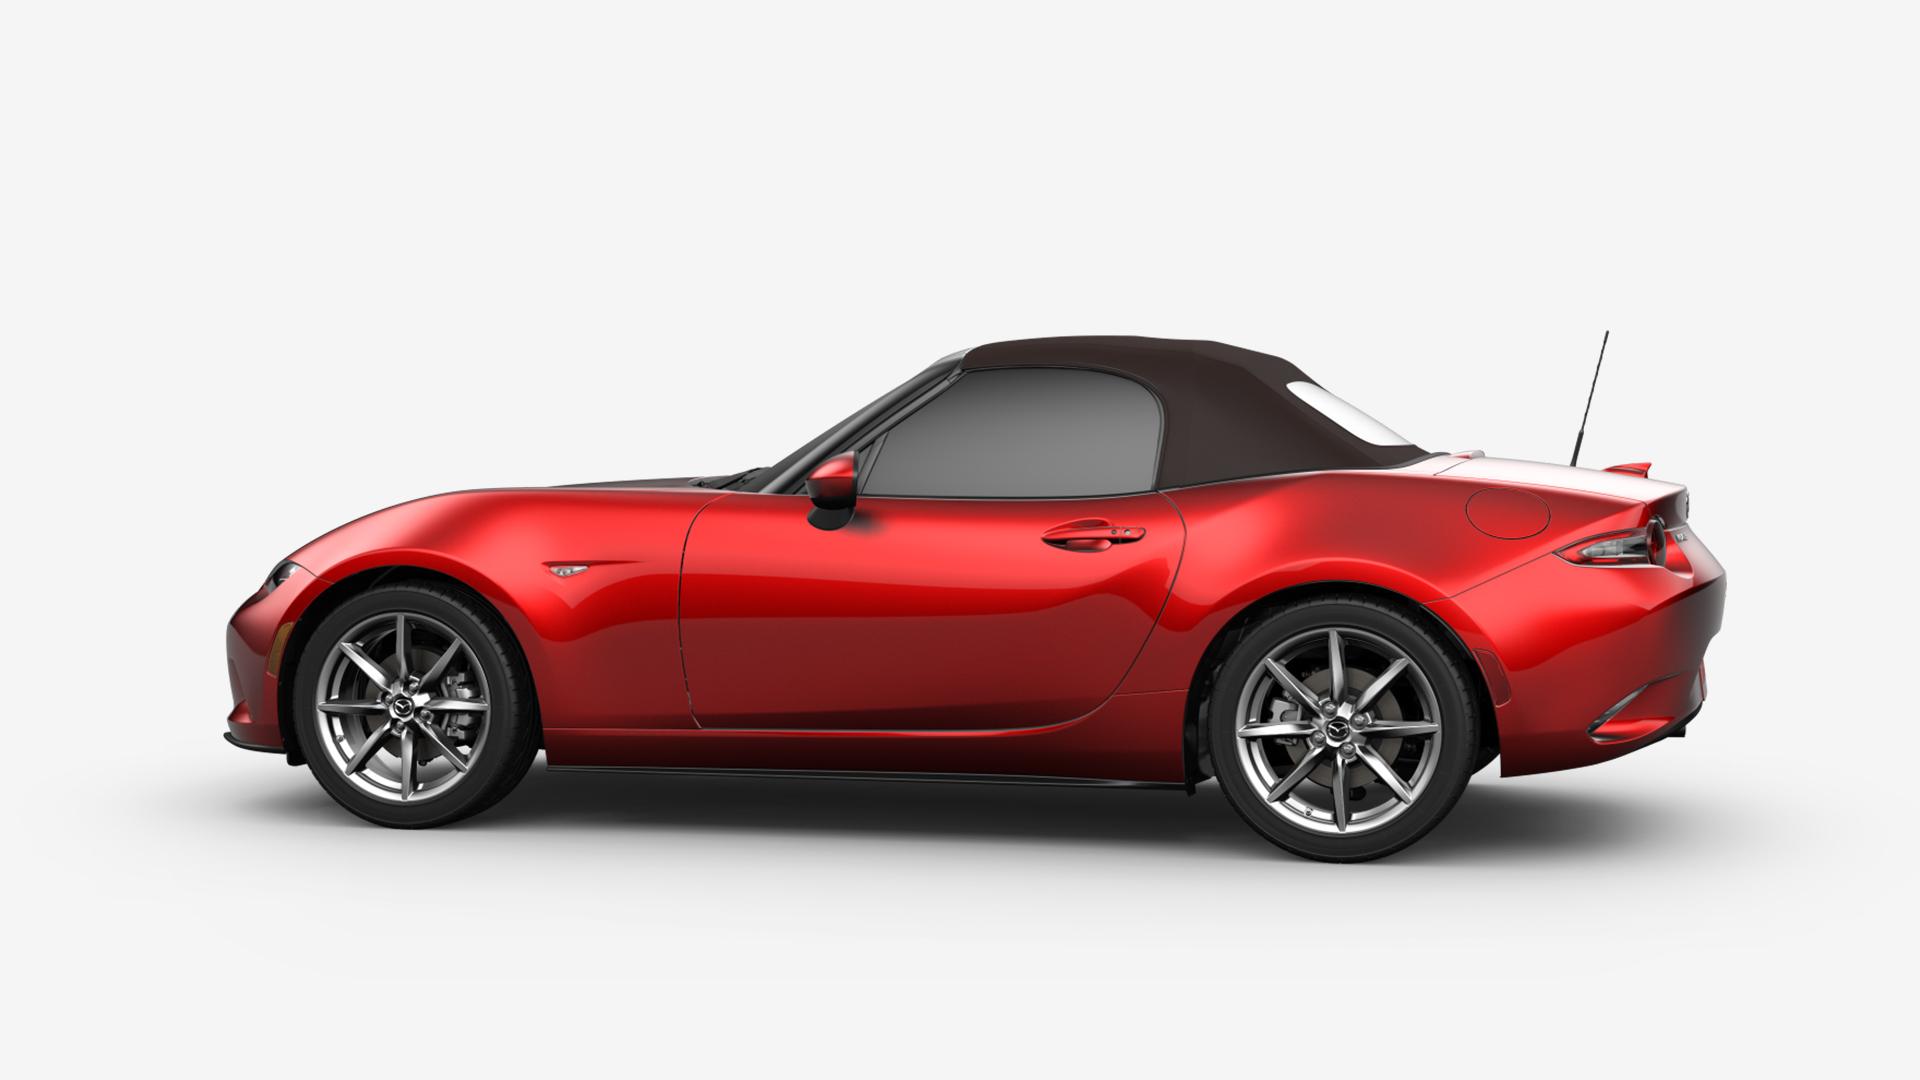 New Mazda Miata >> 2019 Mazda Mx 5 Miata Convertible Roadster Mazda Usa